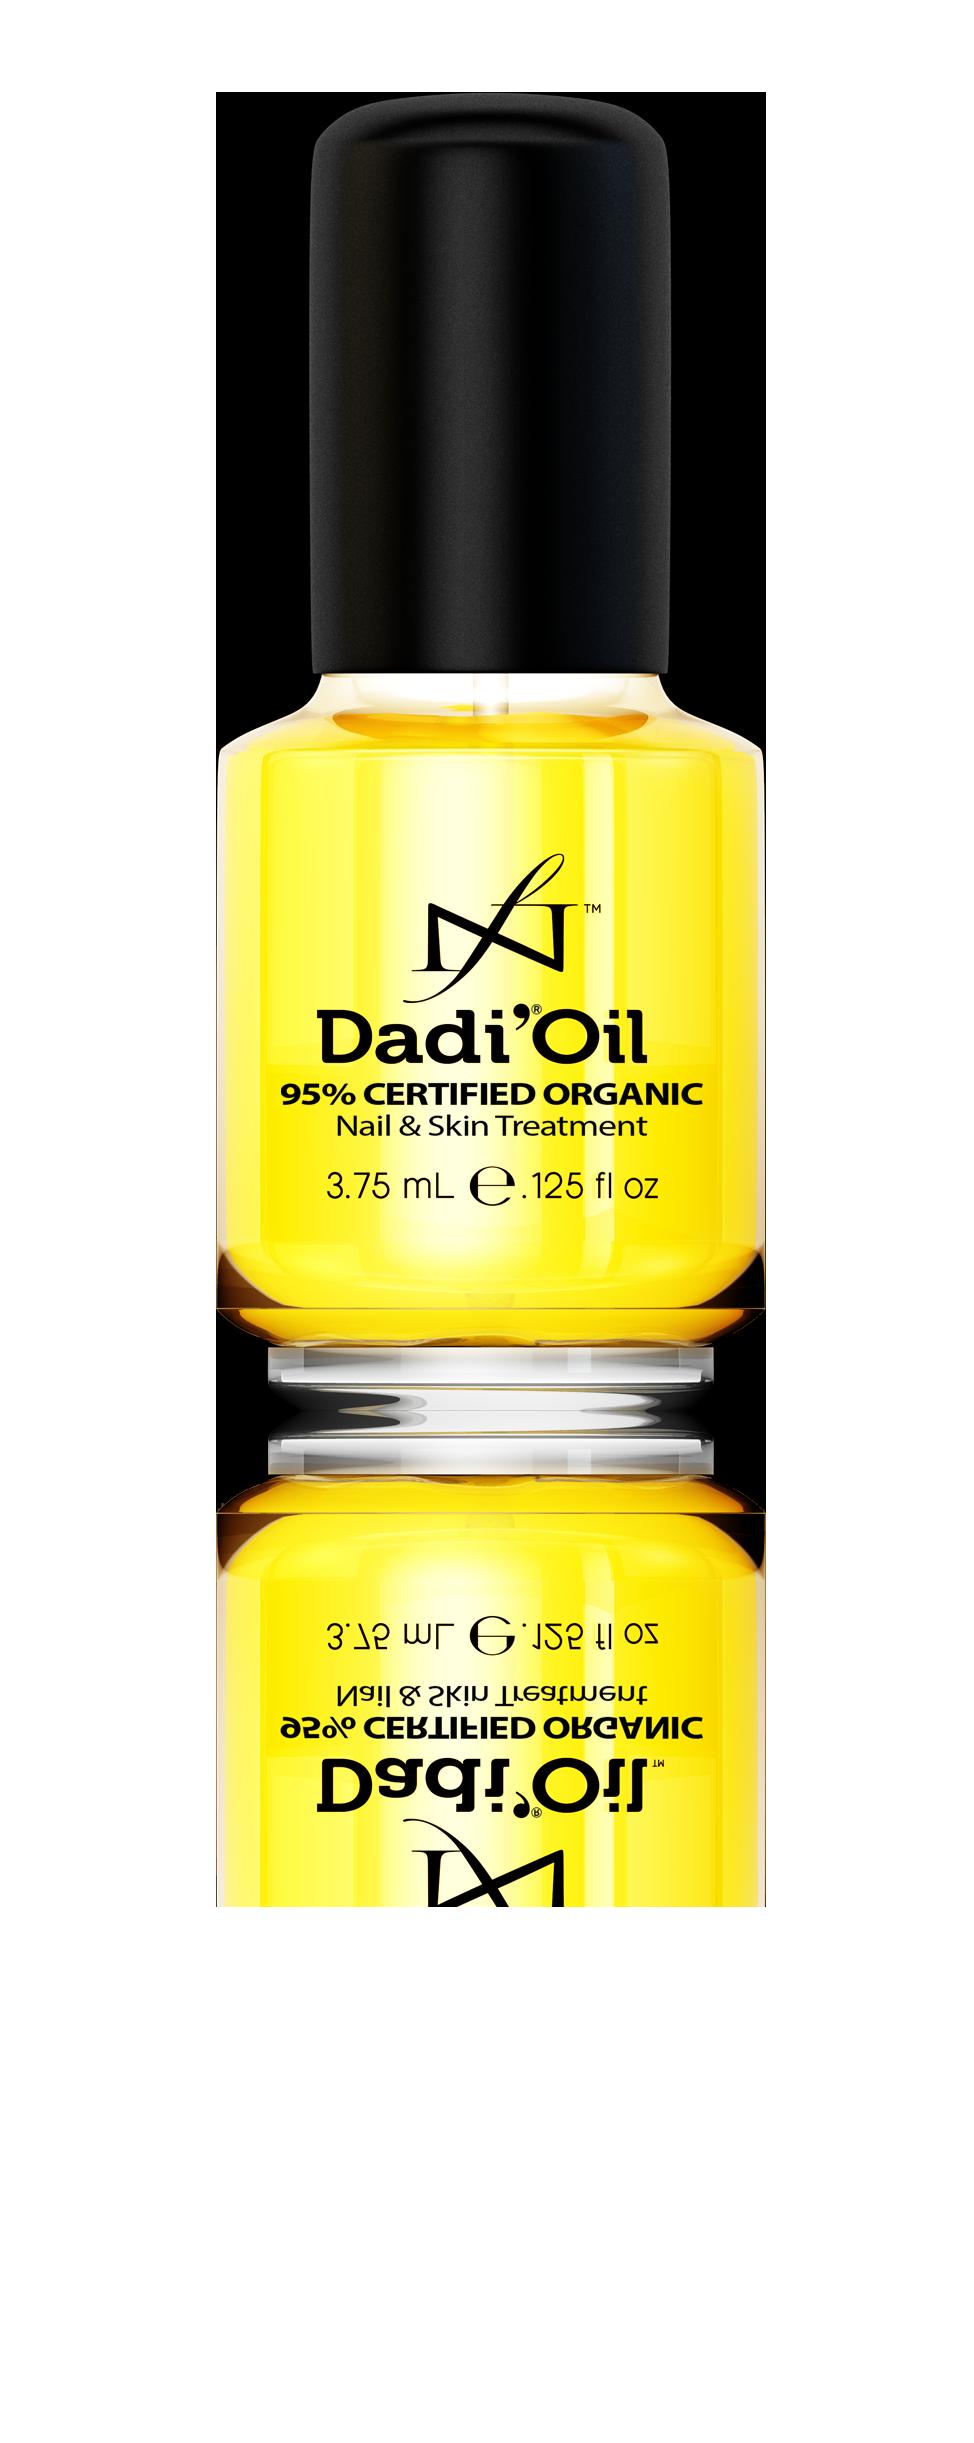 dadi olie dadi oil mybliss nagelstudio balkbrug  overijssel drenthe